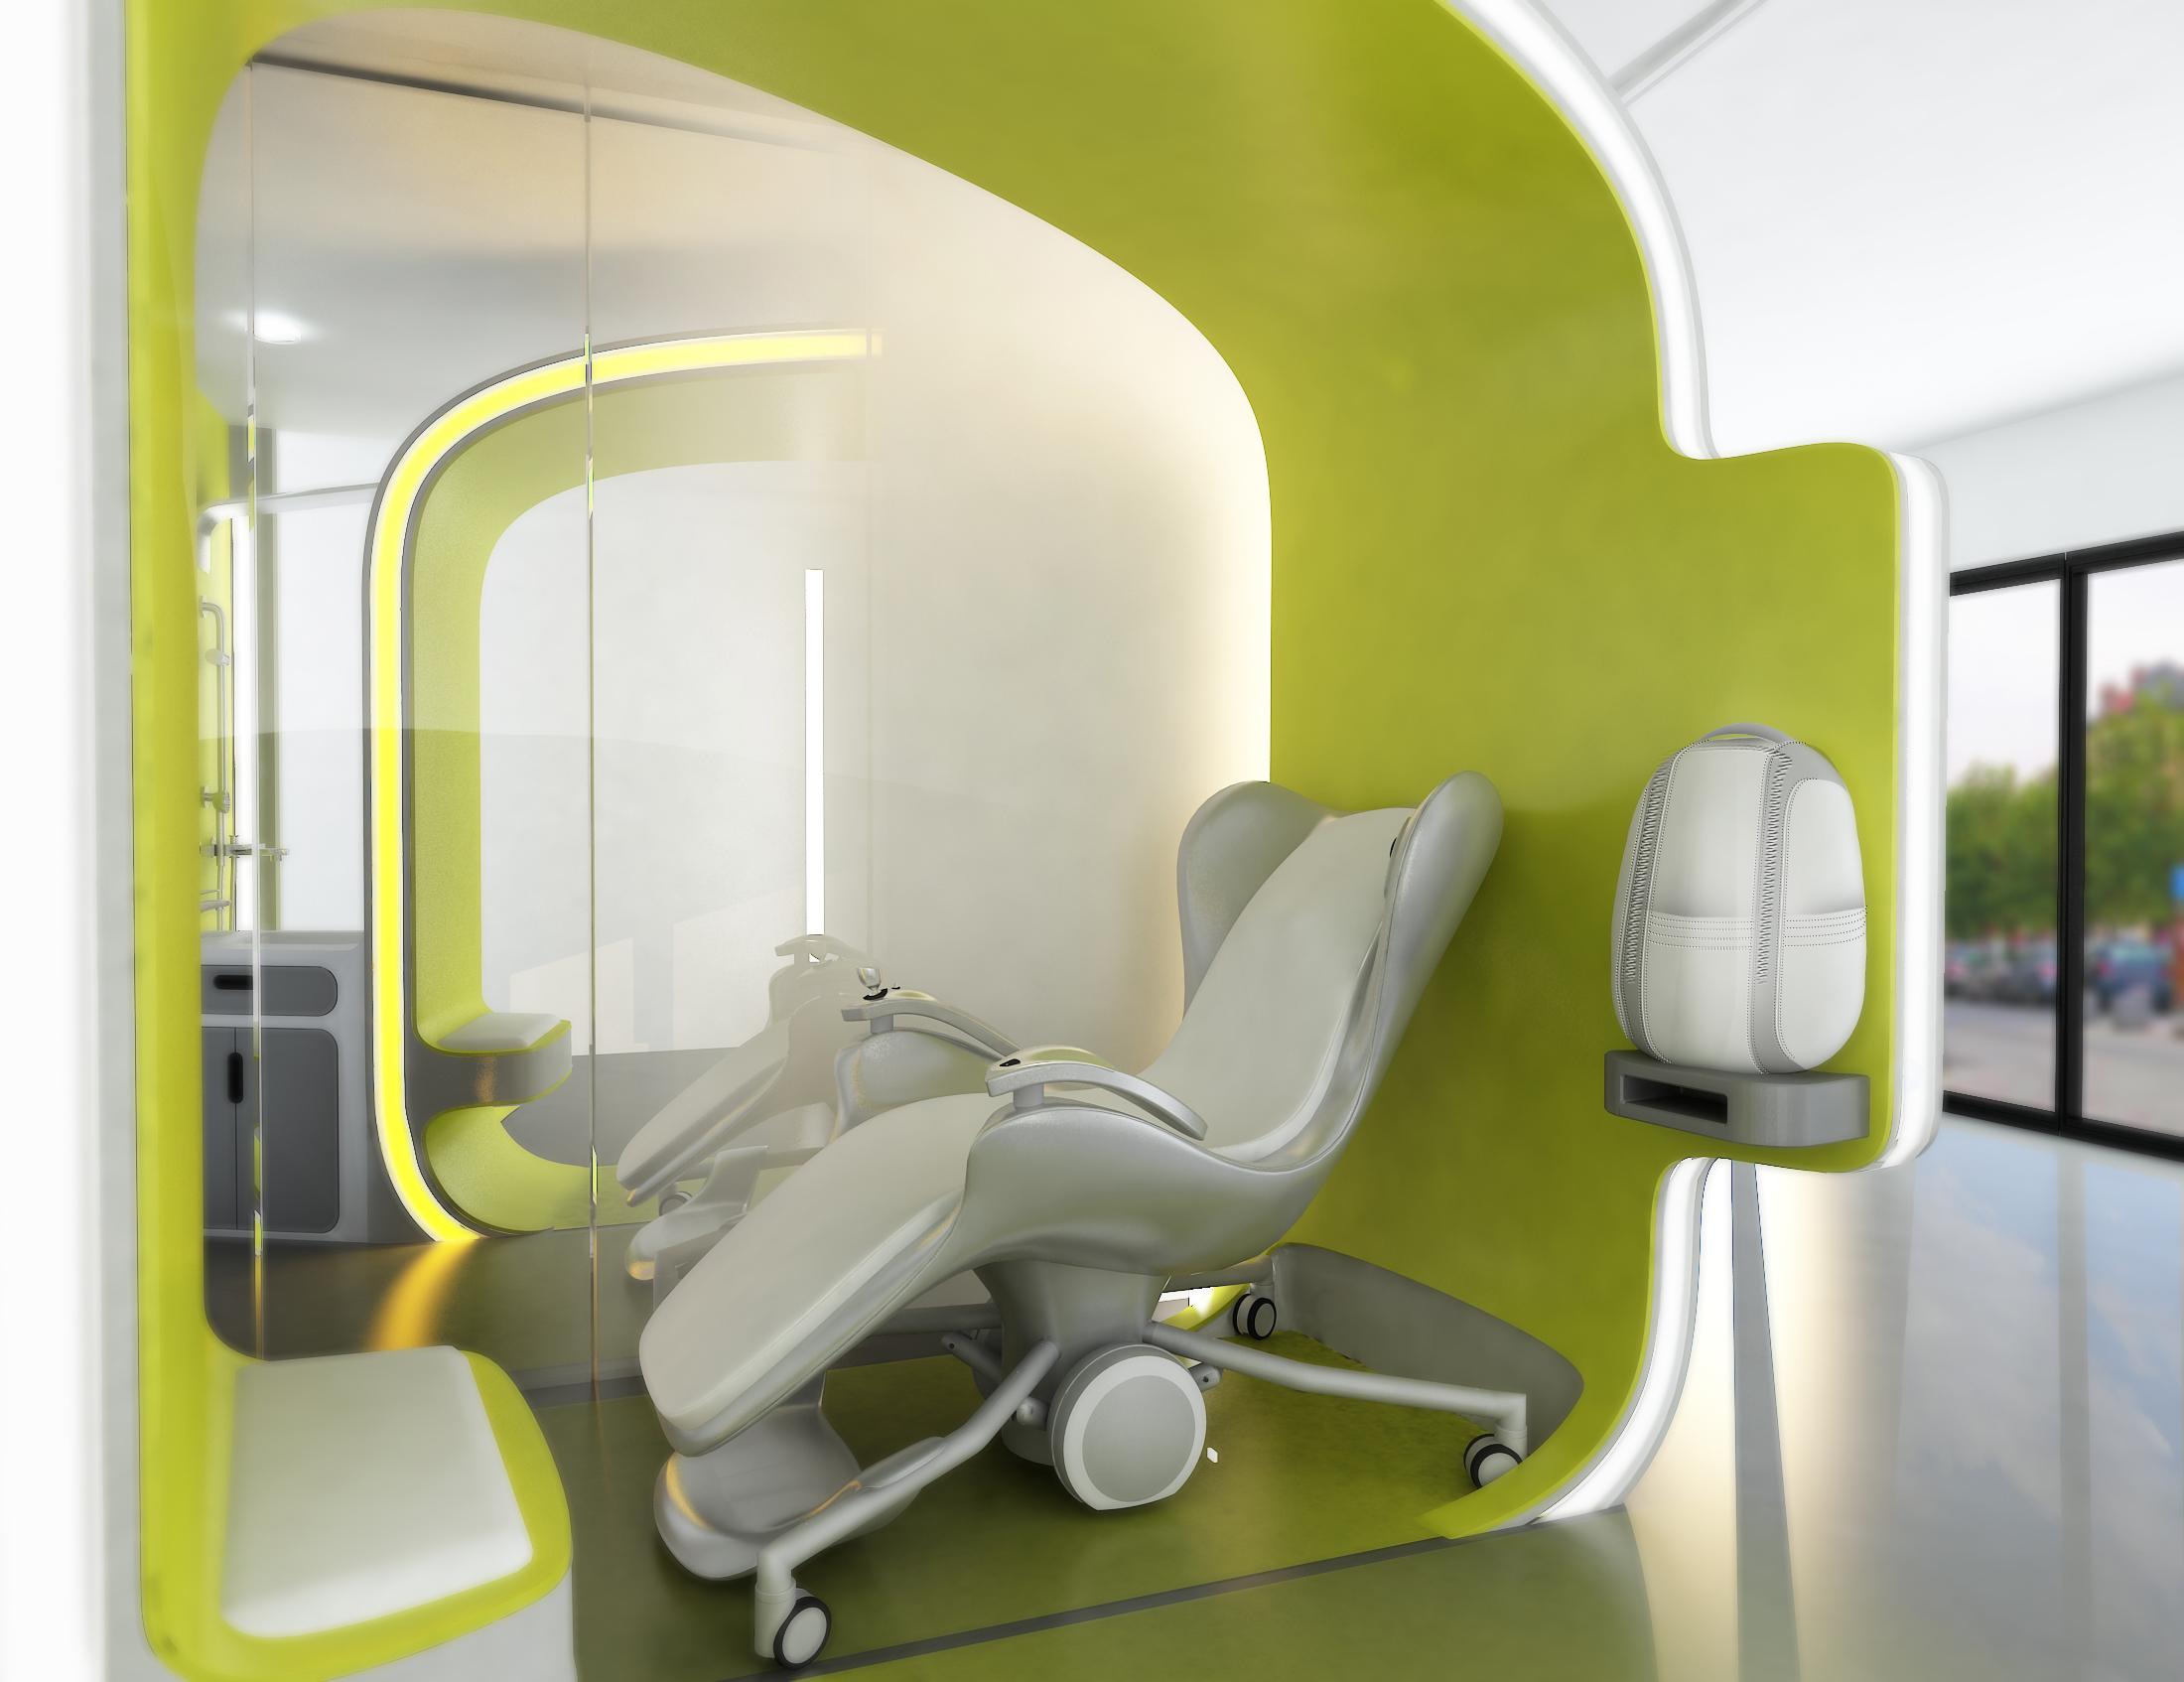 Le concept room OPUS 2 - Concept room